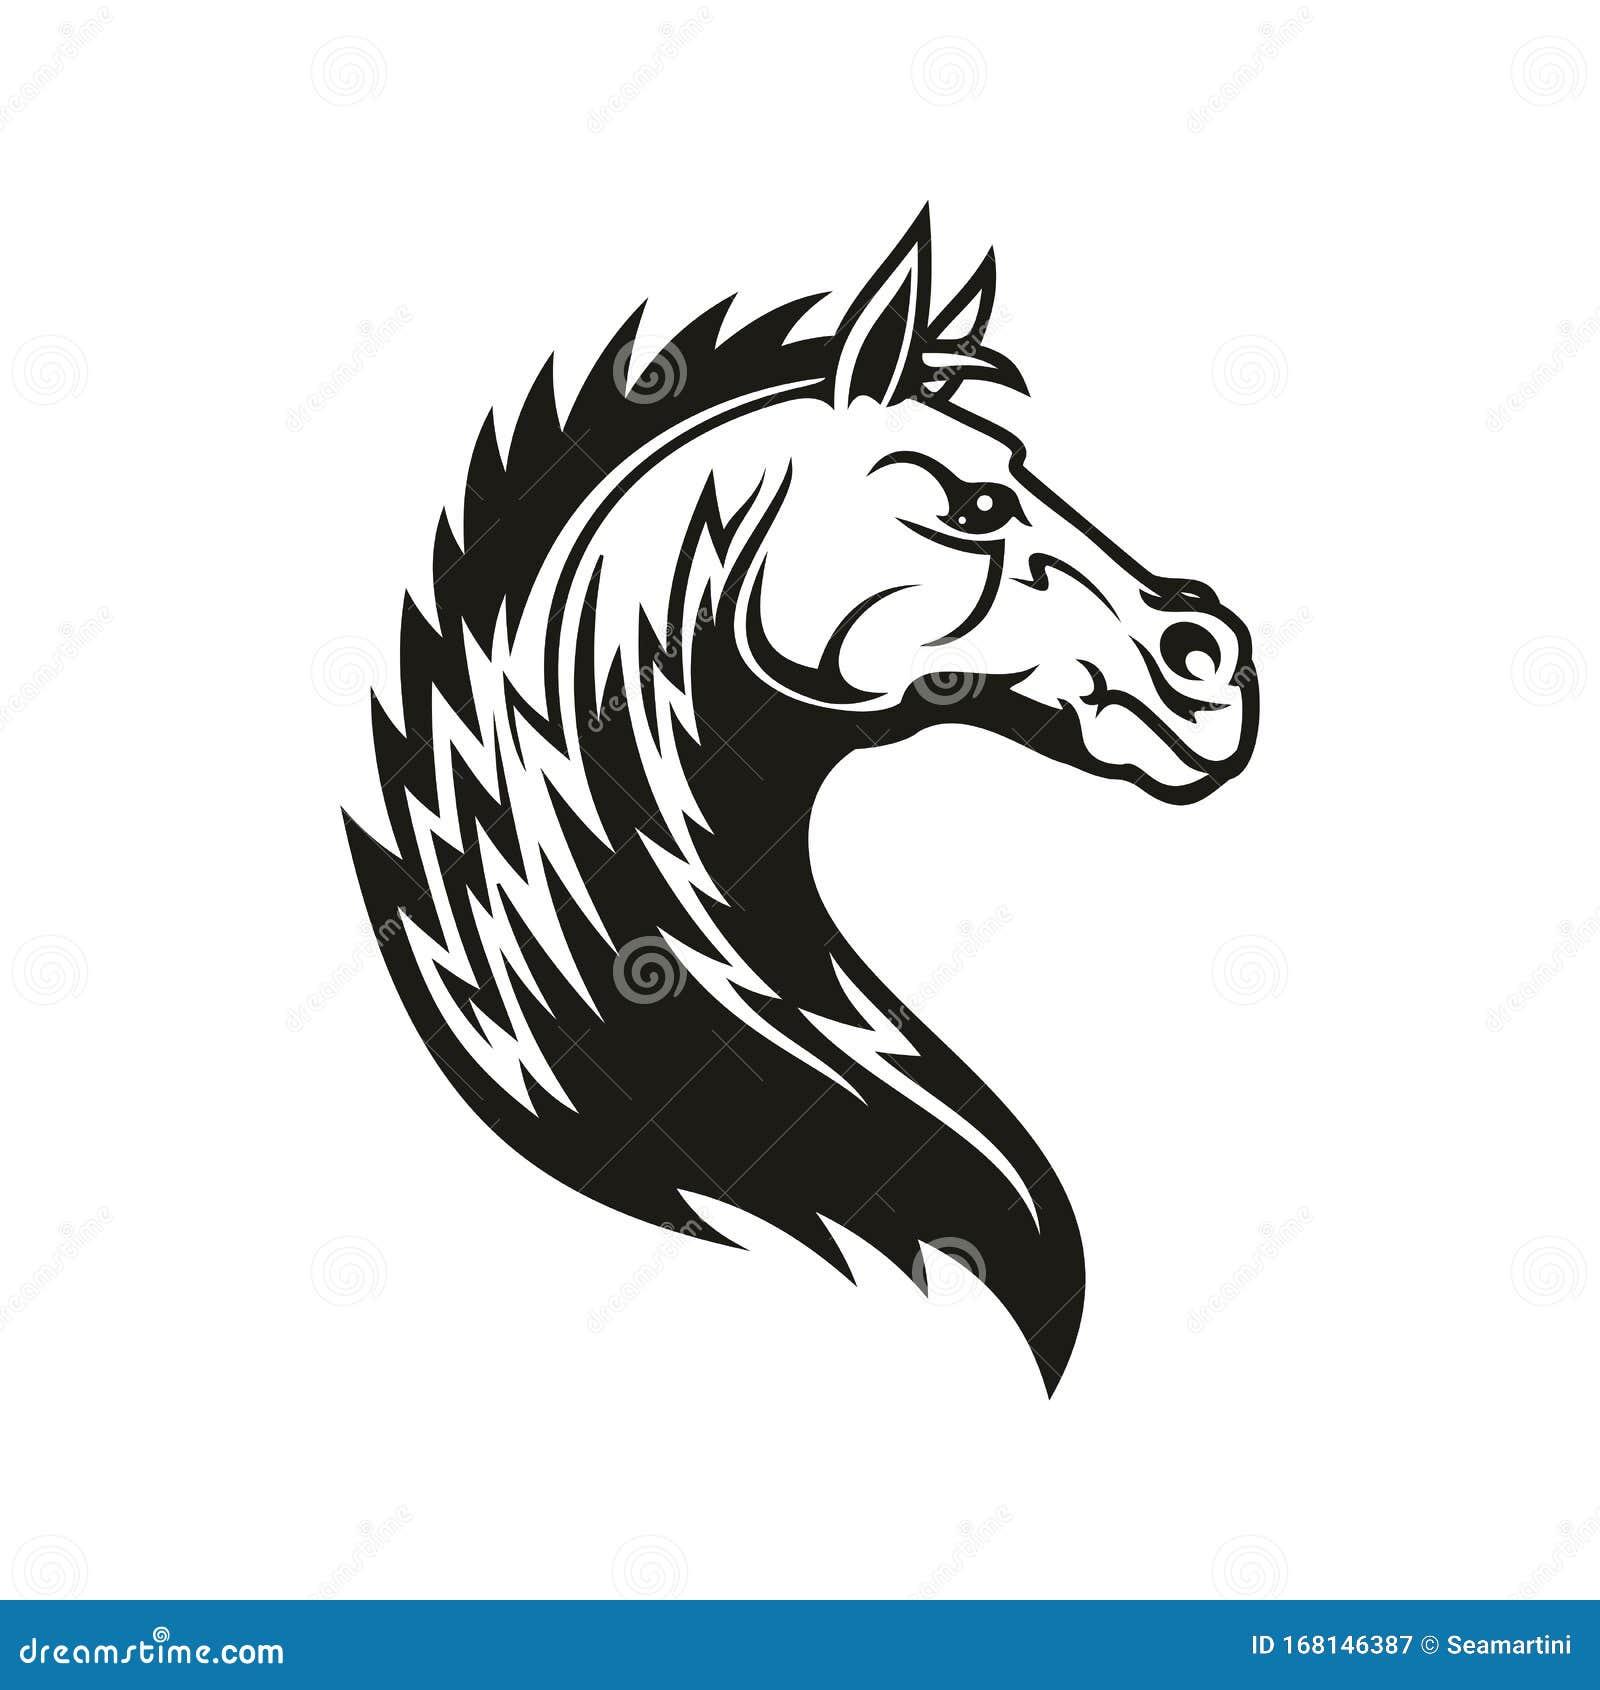 Tribal Horse Head Tattoo Stock Illustrations 734 Tribal Horse Head Tattoo Stock Illustrations Vectors Clipart Dreamstime